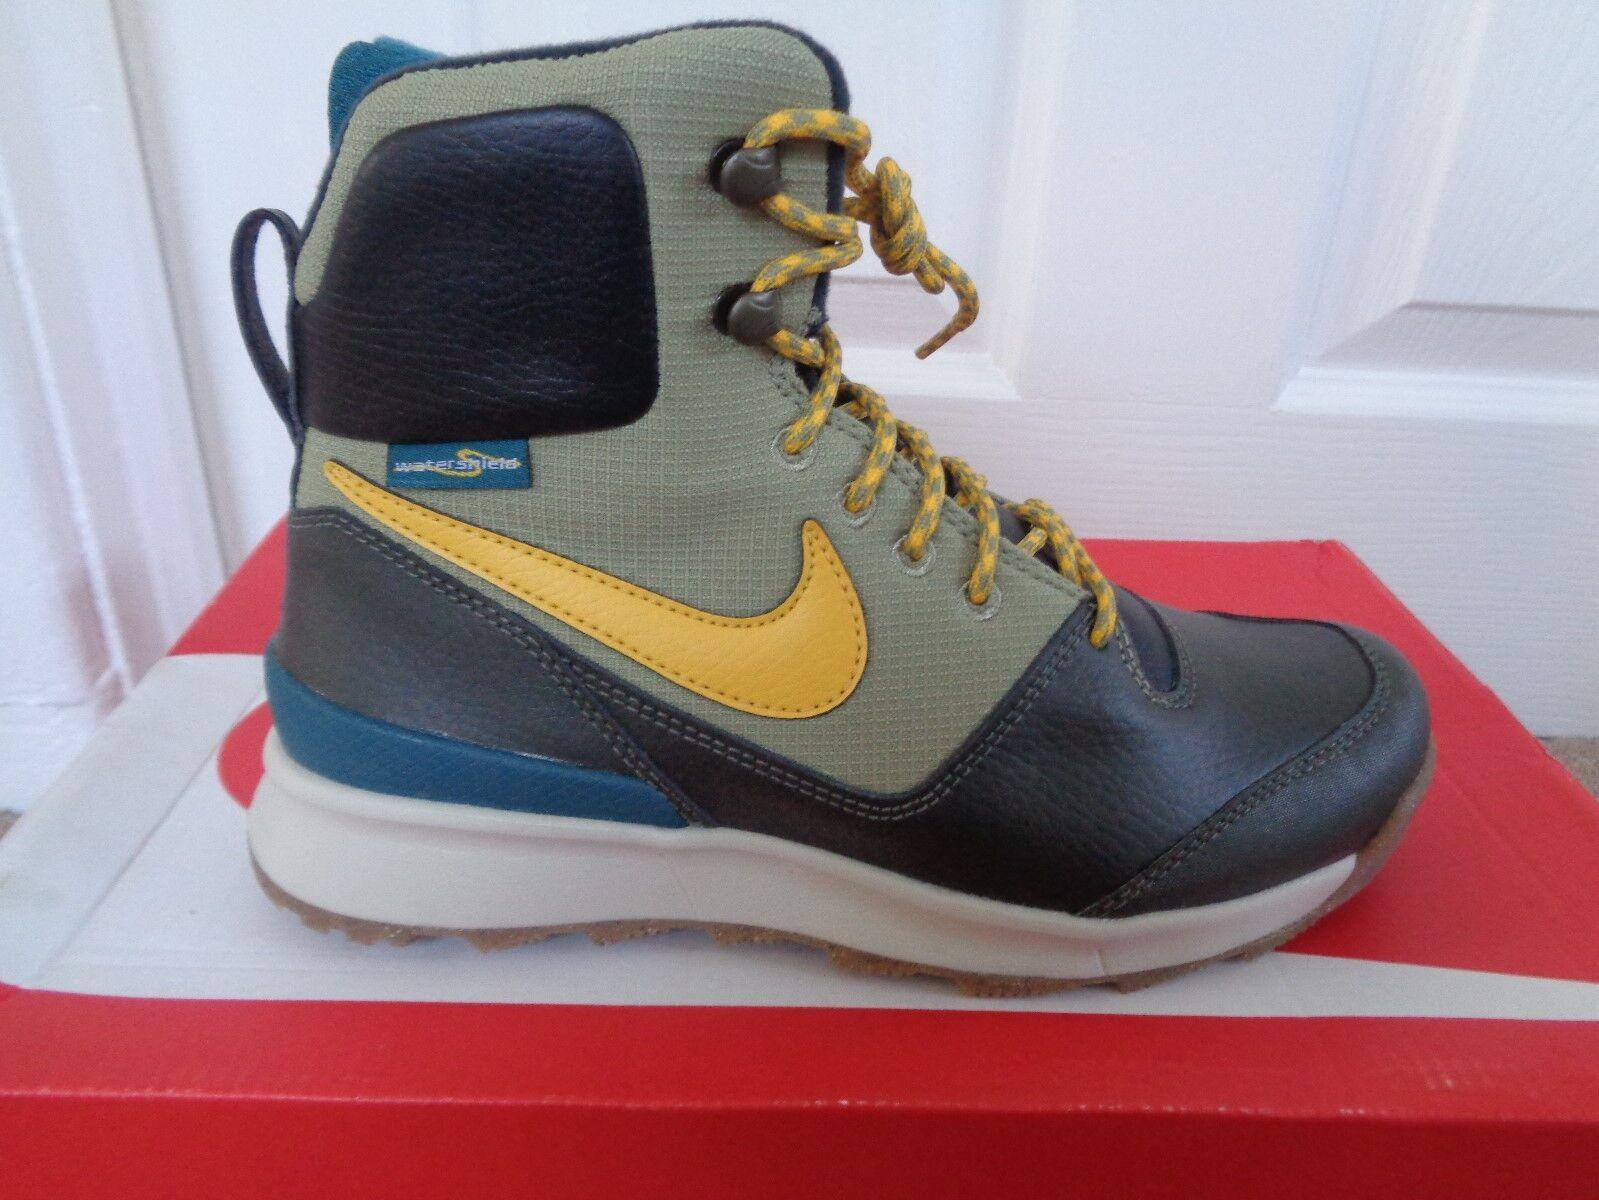 Nike Stasis ACG Femme trainers boots 616180 270 uk 3.5 eu 36.5 us 6 NEW+BOX